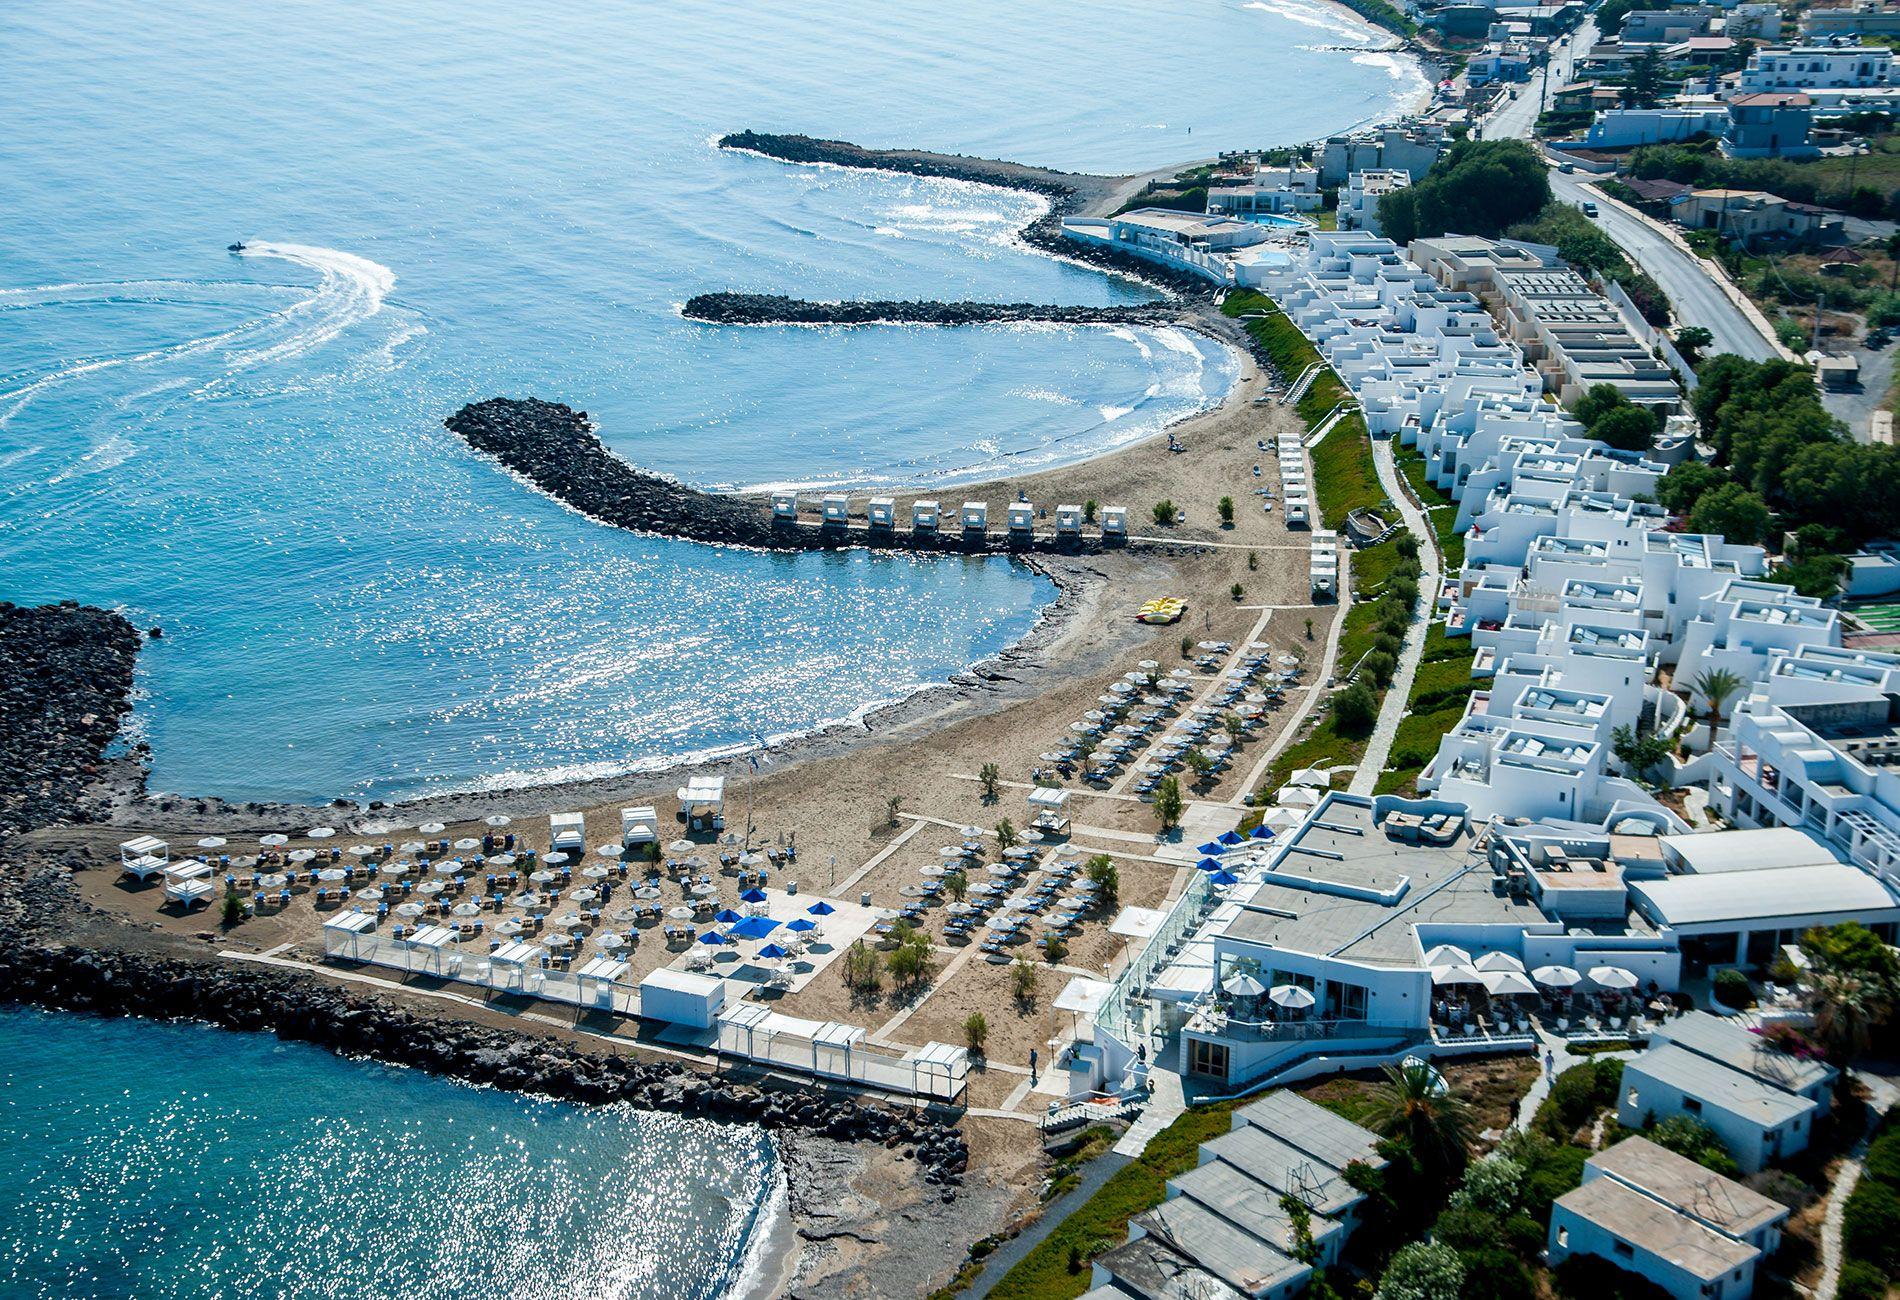 4* Knossos Beach Bungalows & Suites - Ηράκλειο, Kρήτη ✦ 4 Ημέρες (3 Διανυκτερεύσεις) ✦ 2 άτομα ✦ Πρωινό ✦ 28/08/2020 έως 20/09/2020 ✦ Μπροστά στην Παραλία!